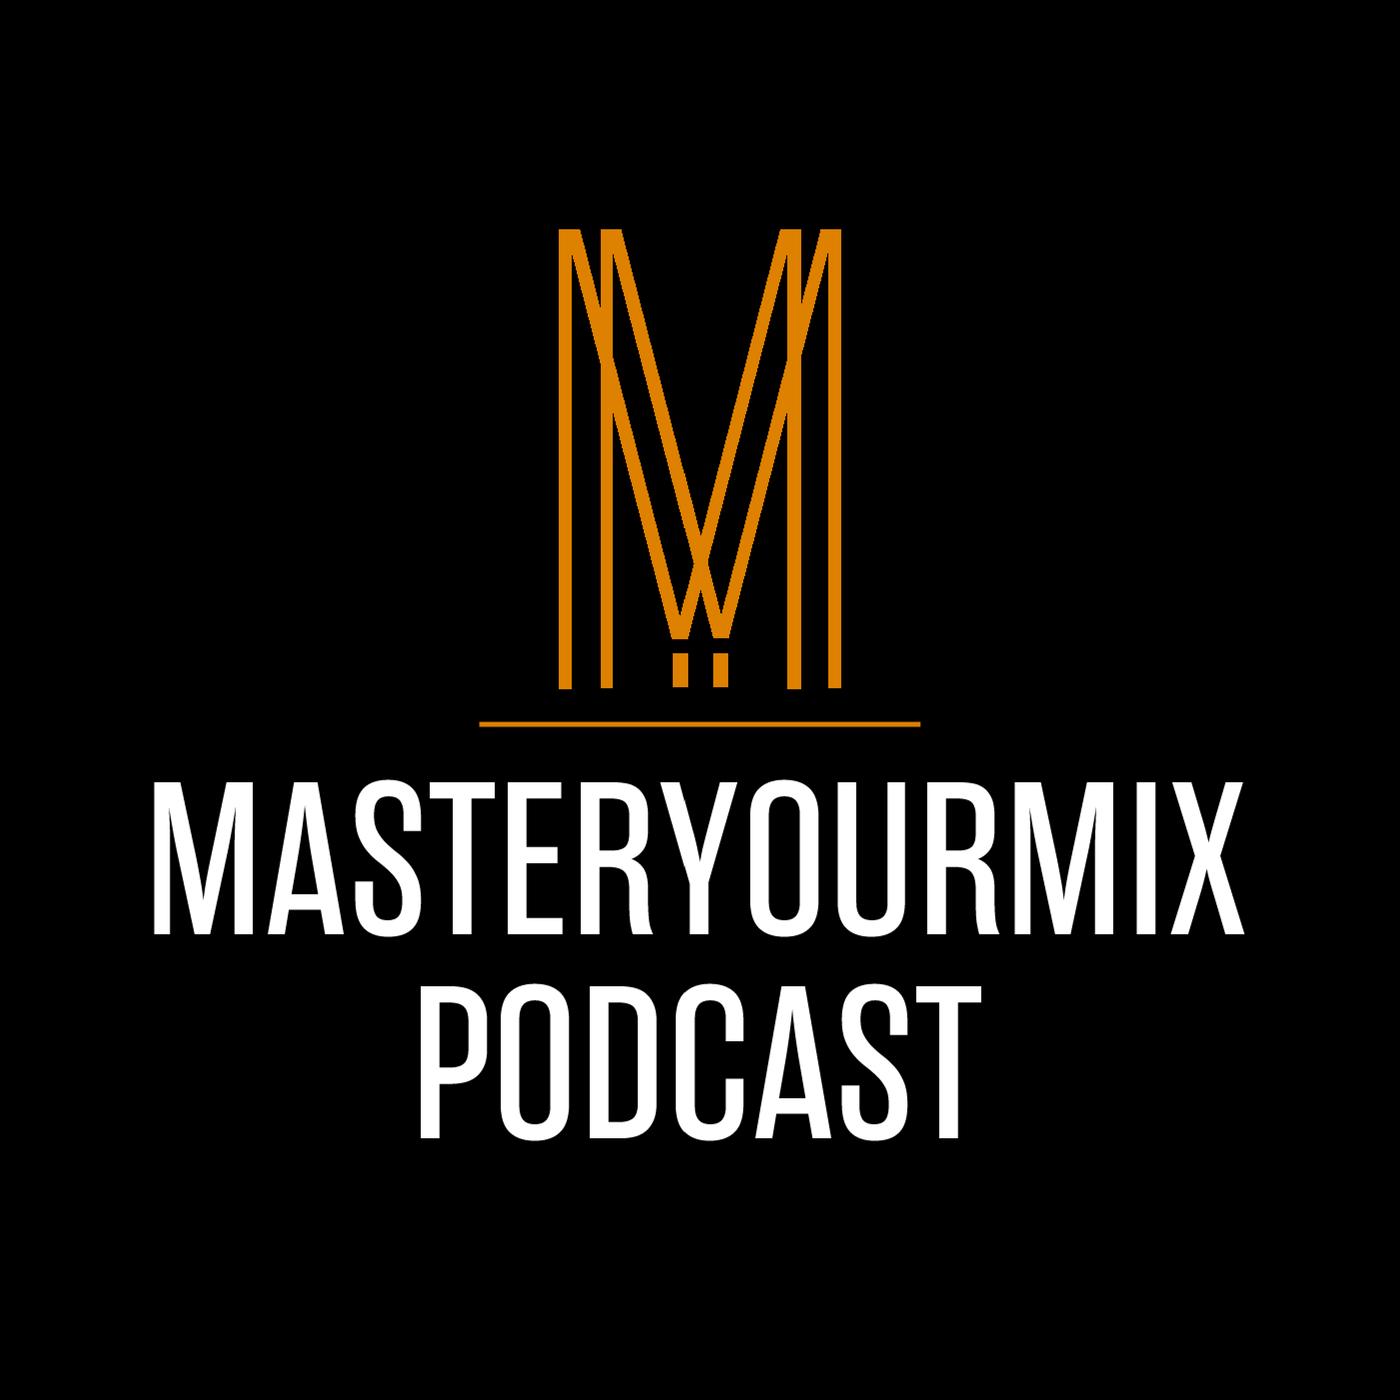 MasterYourMix Podcast